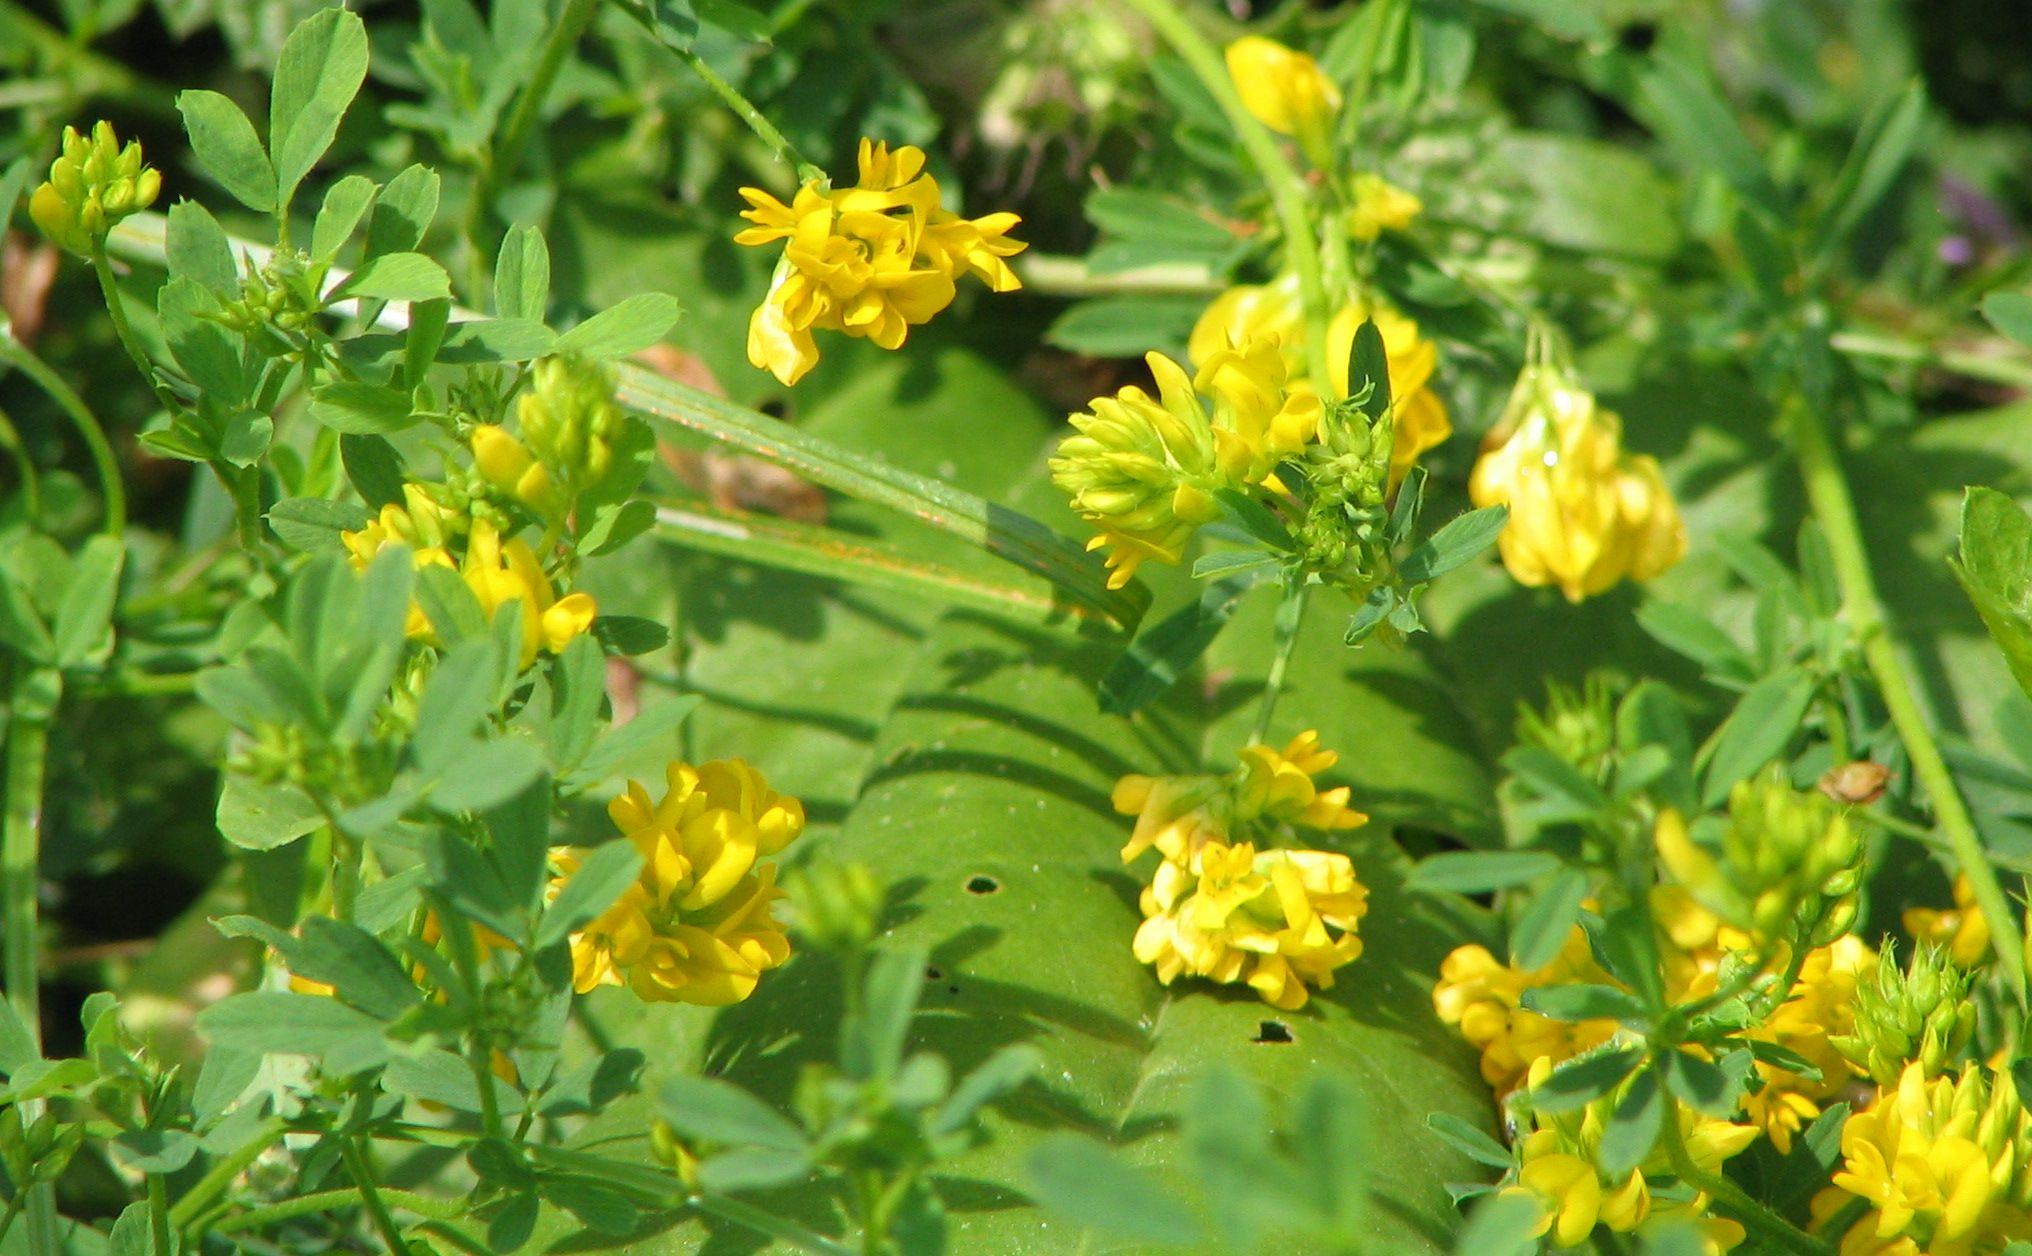 Image result for yellow flowered alfalfa homestead pinterest image result for yellow flowered alfalfa mightylinksfo